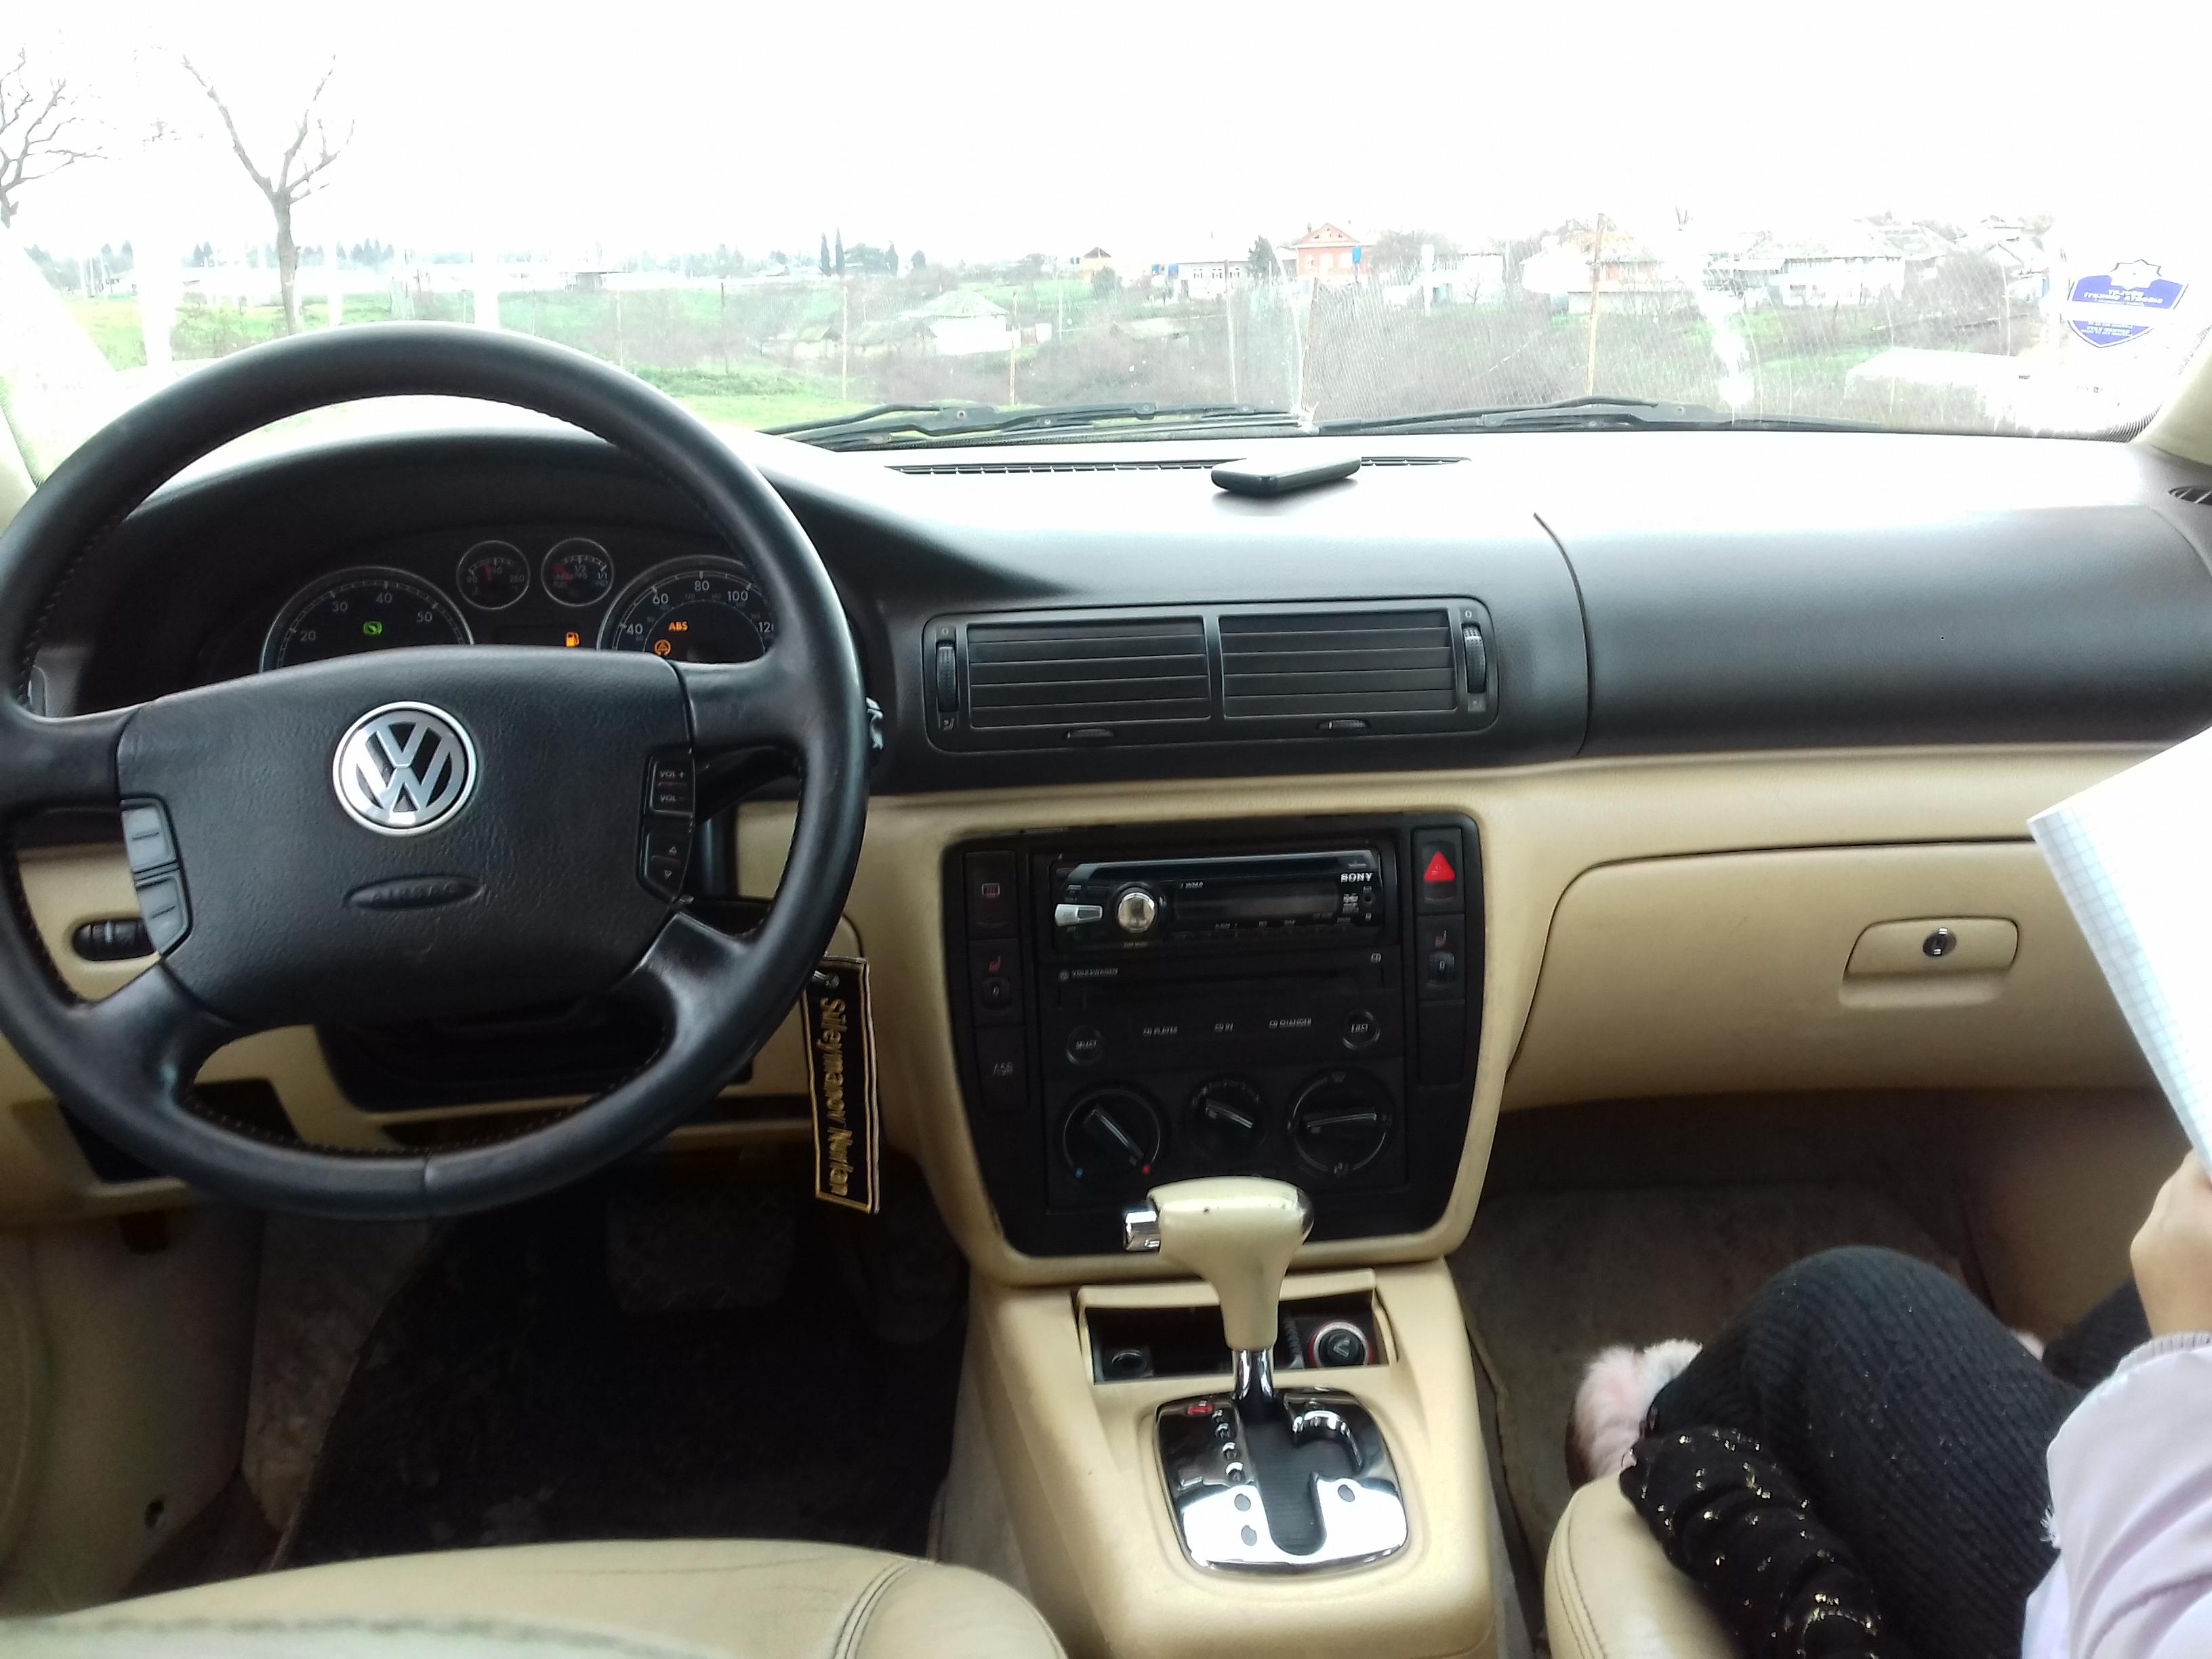 Volkswagen Passat 1.8(lt) 2001 Подержанный  $4500